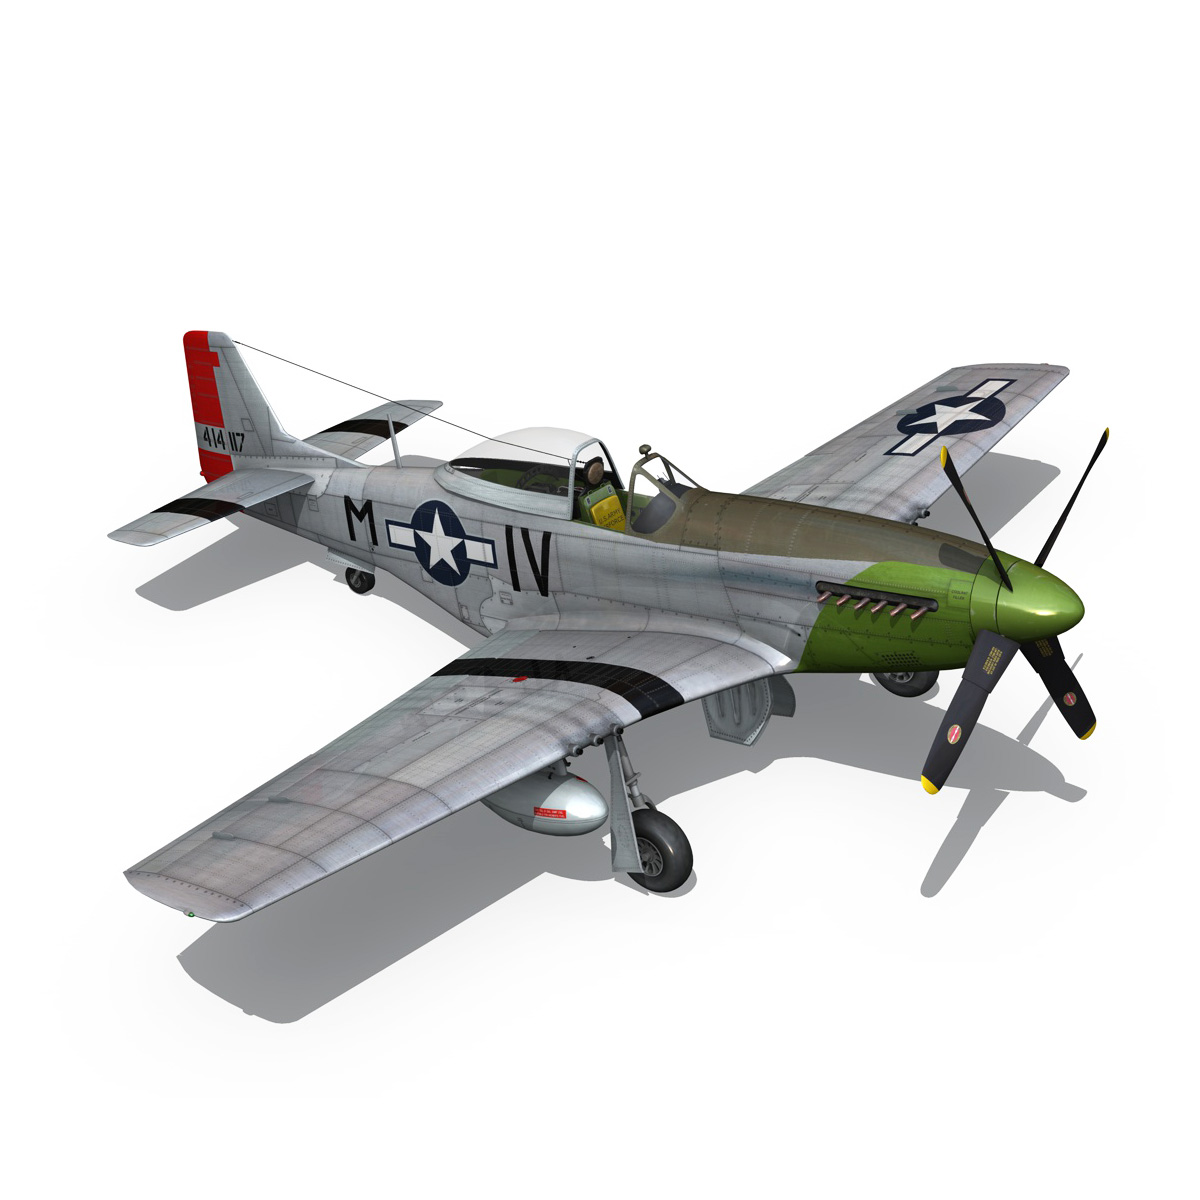 north american p-51d mustang – stinky 3d model fbx c4d lwo obj 269610